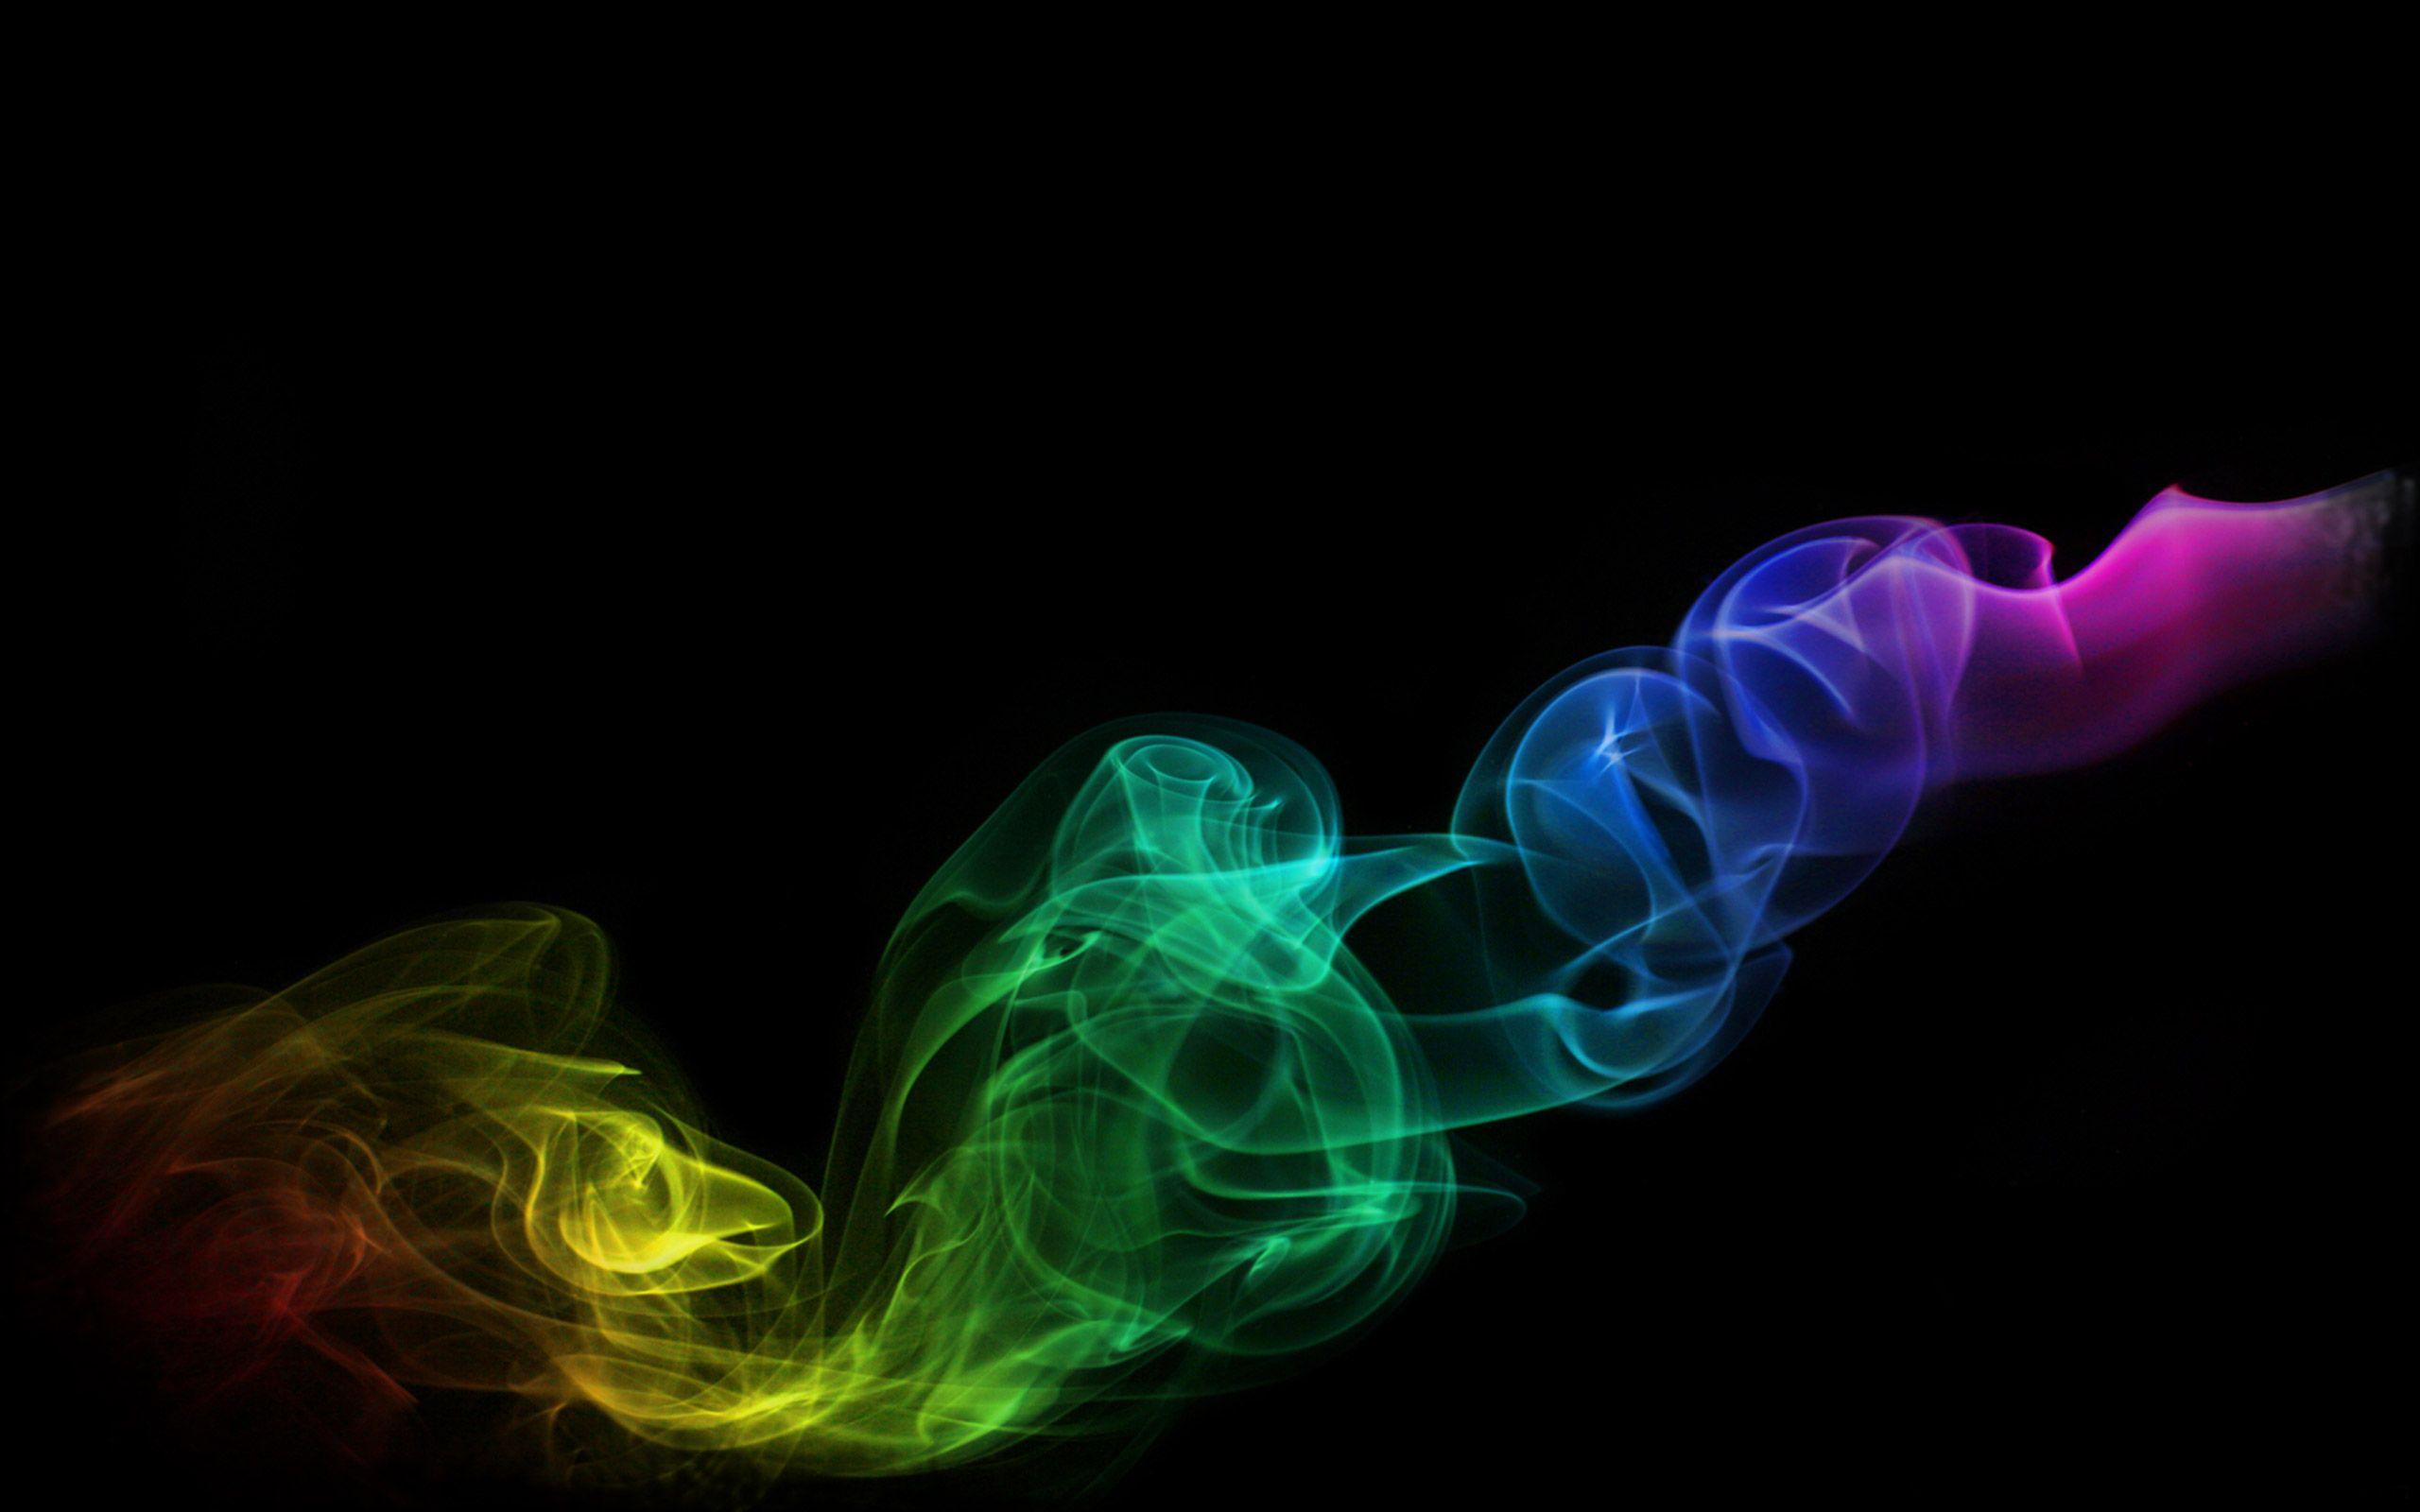 [47+] Cool Smoke Wallpapers on WallpaperSafari